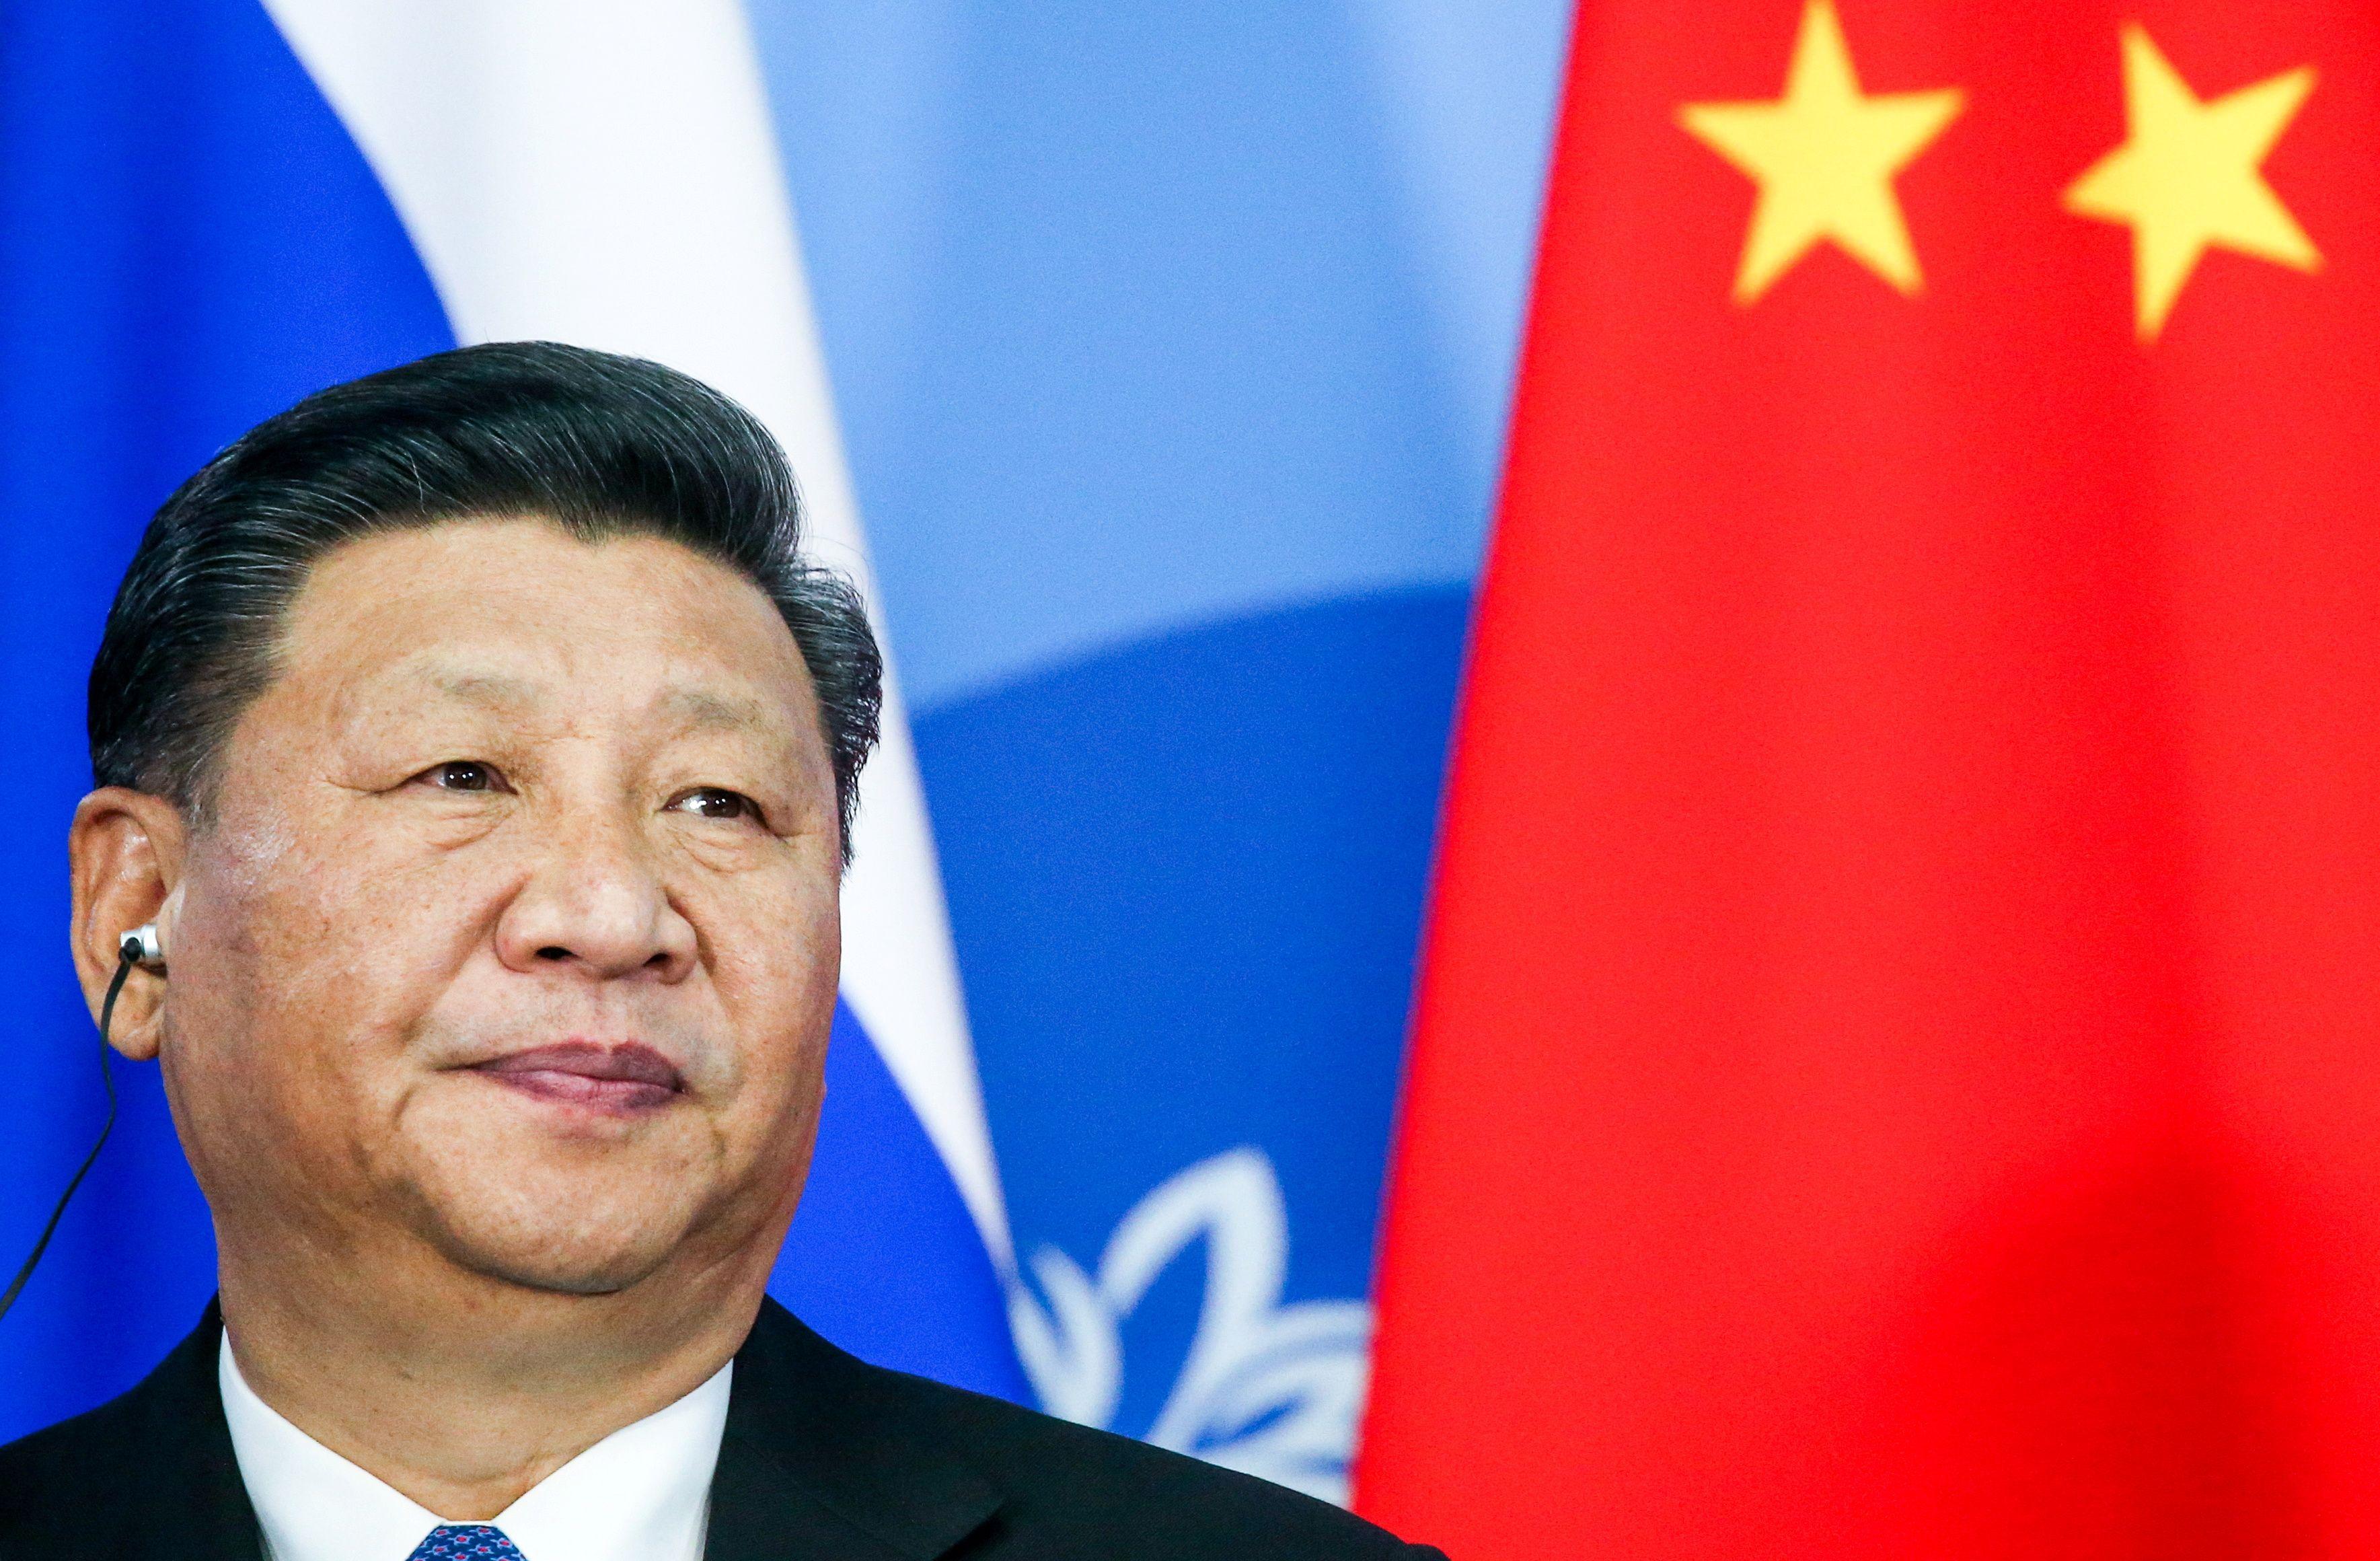 FIVE REASONS CHINA ISN'T BACKING DOWN